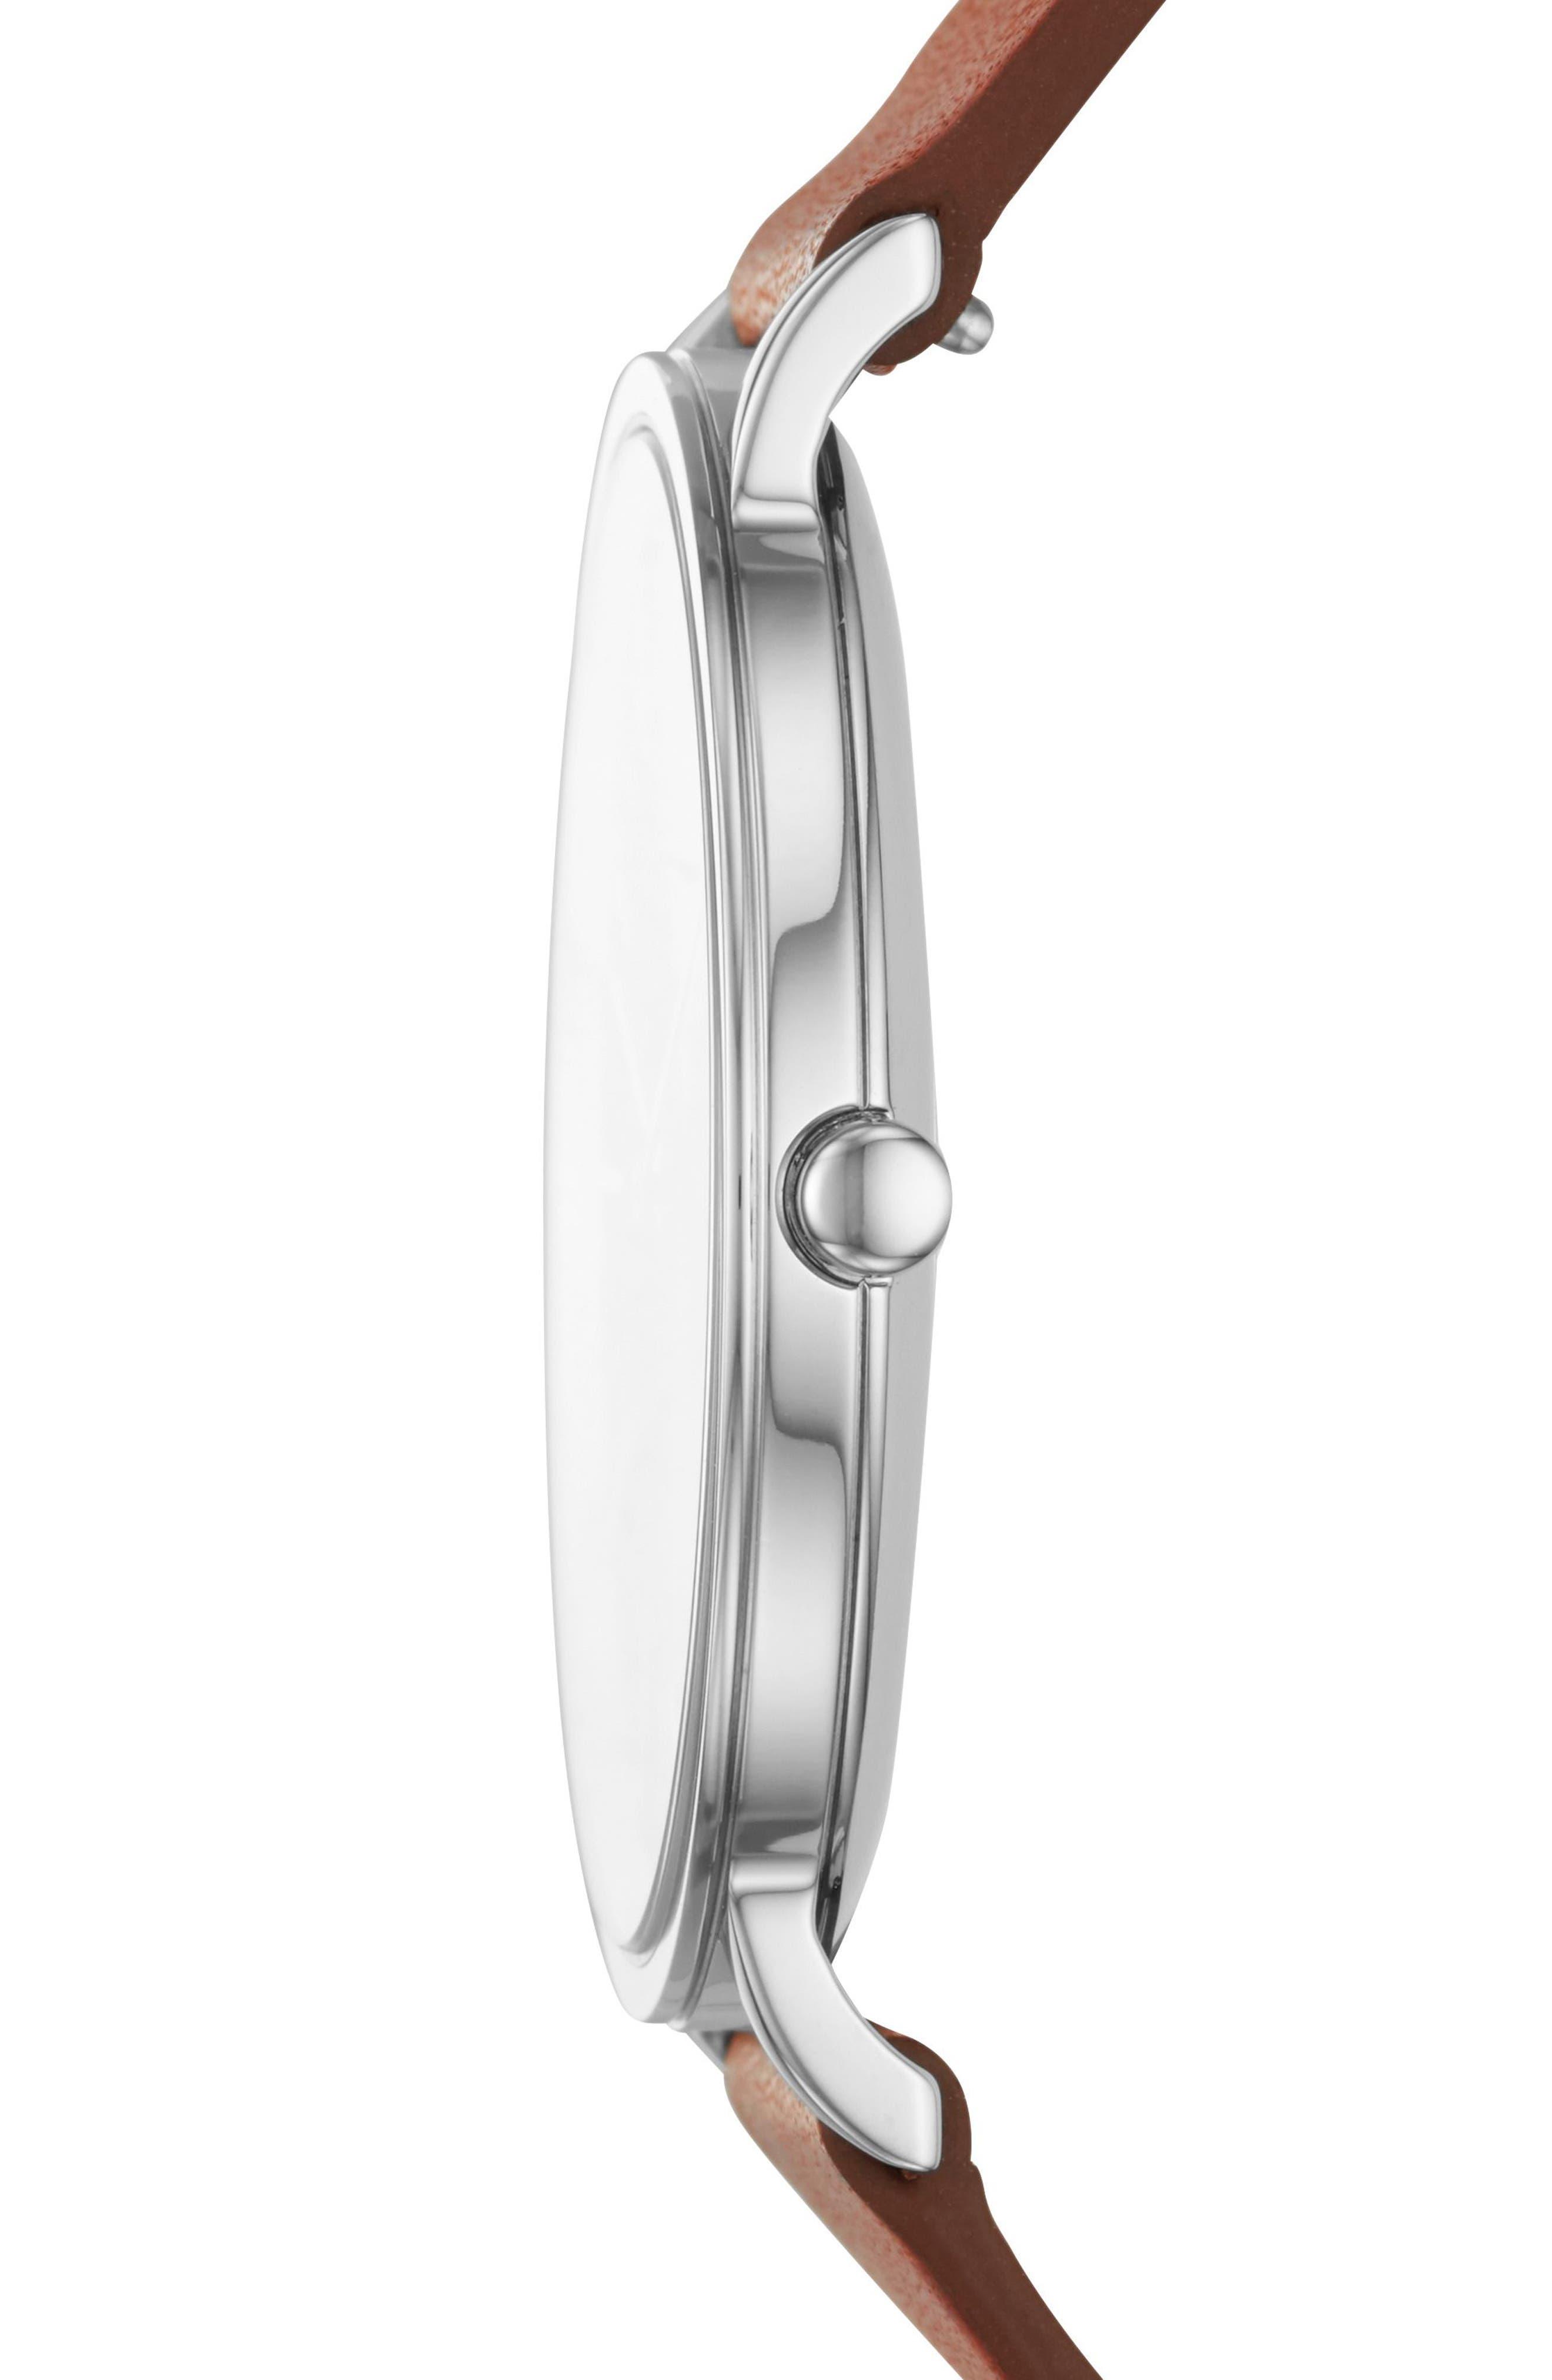 SKAGEN, Hagen Slim Leather Strap Watch, 38mm, Alternate thumbnail 2, color, 200